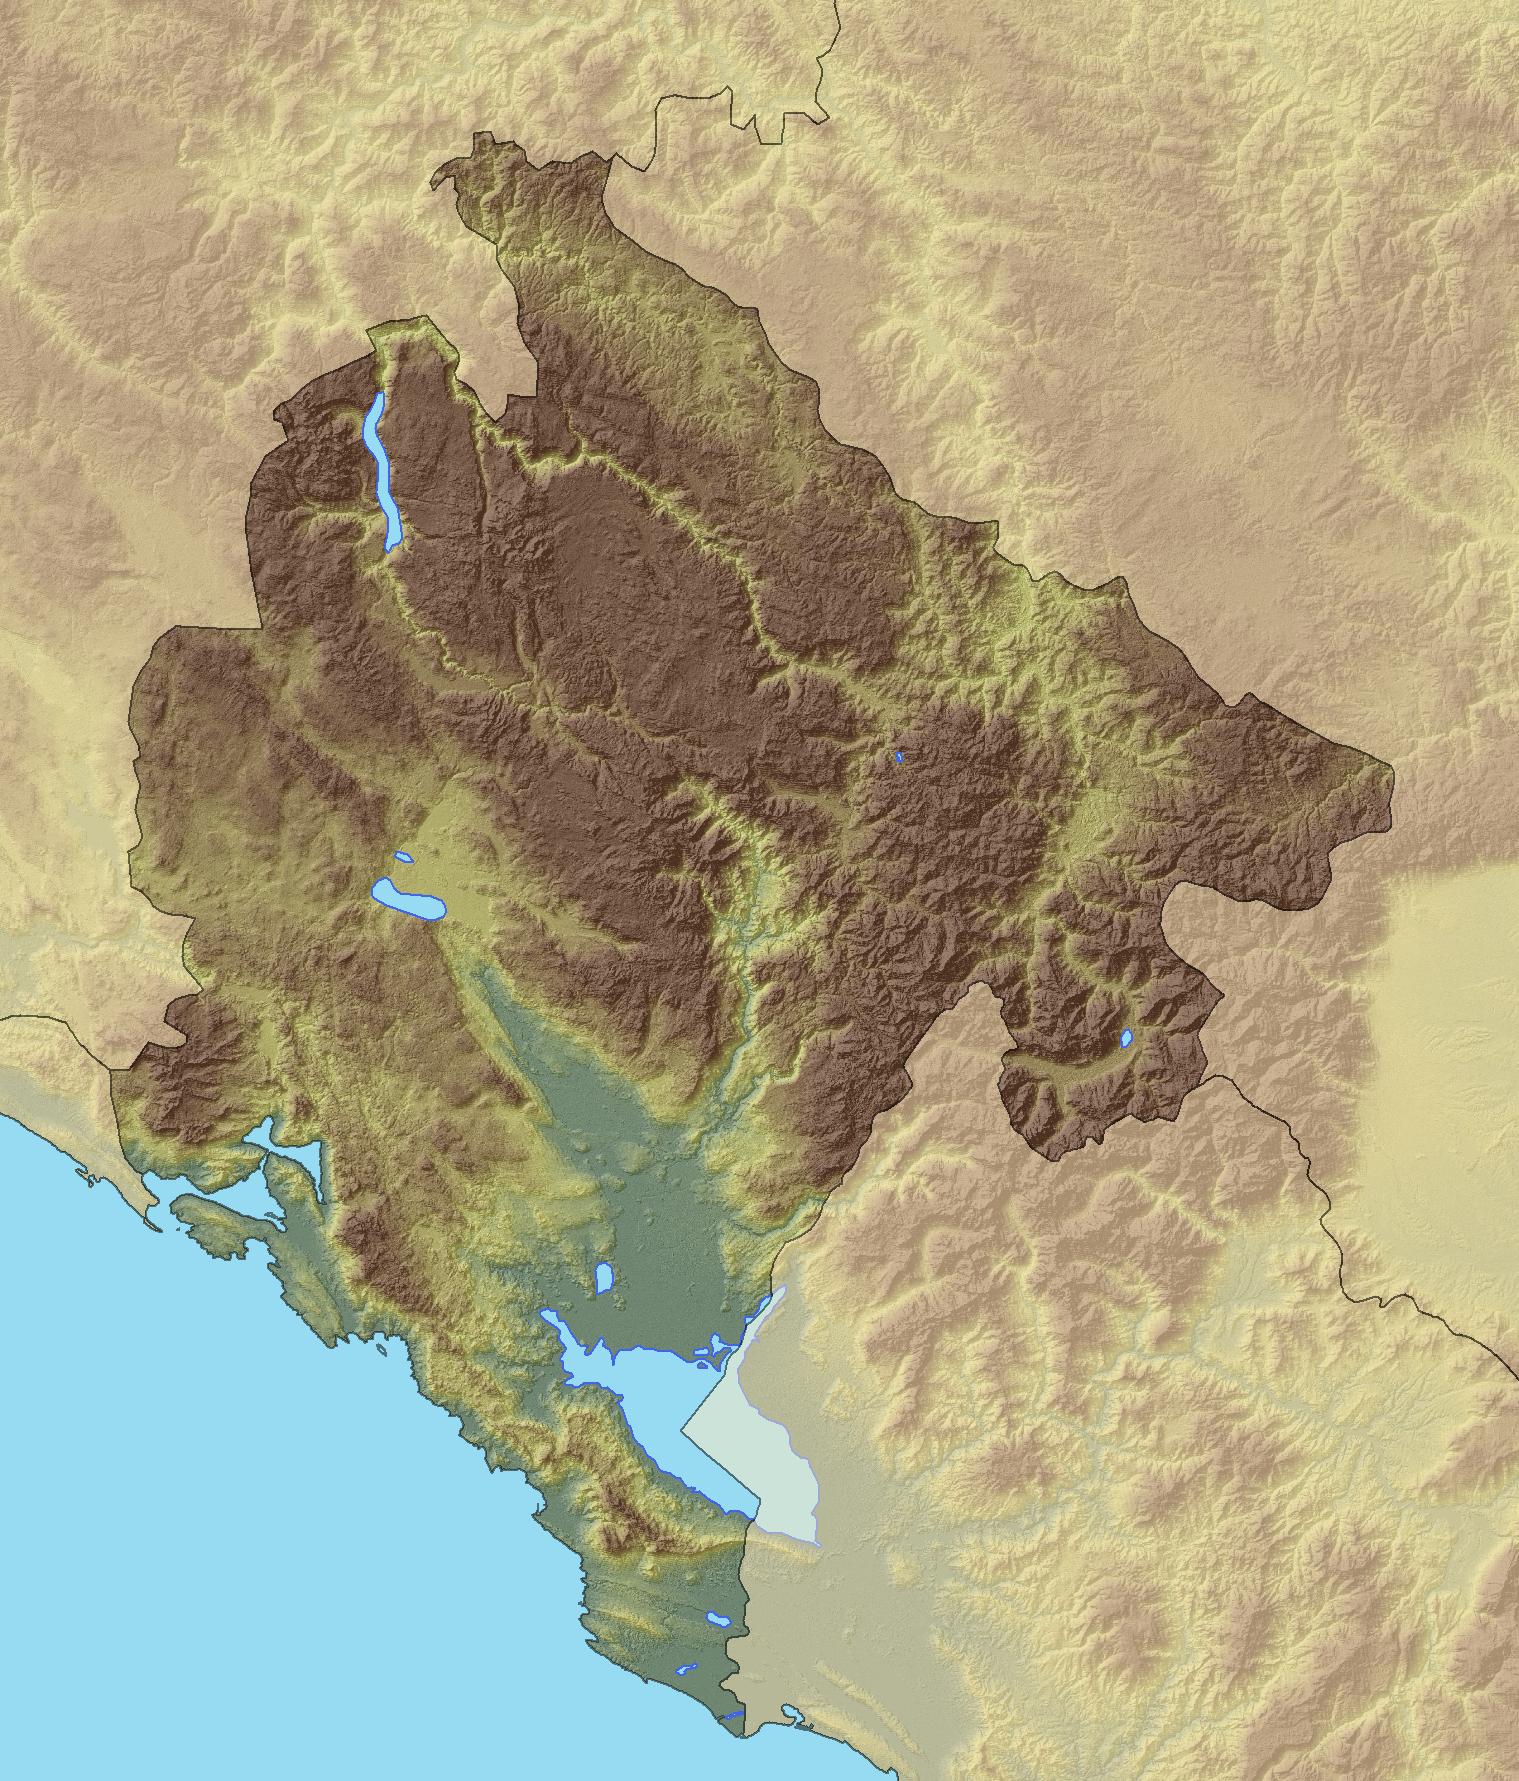 Louisiana Map Alexandria%0A Relief map of Montenegro